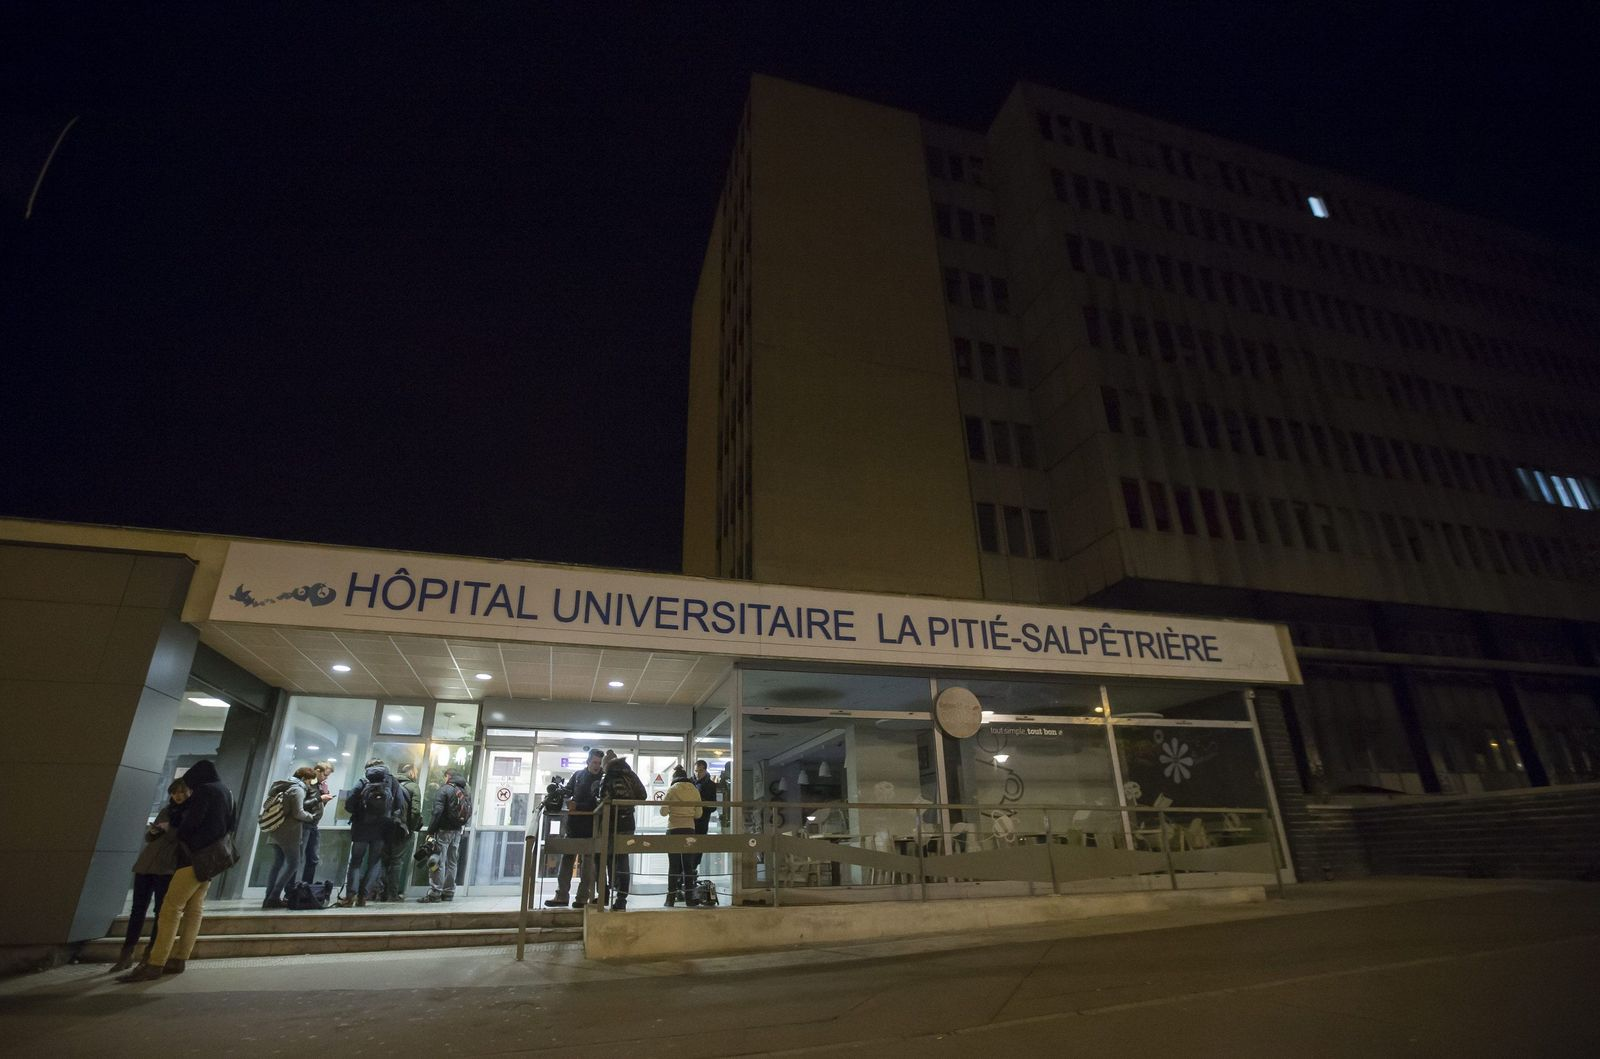 Paris/ Krankenhaus/ Universite La Pitie-Salpetriere